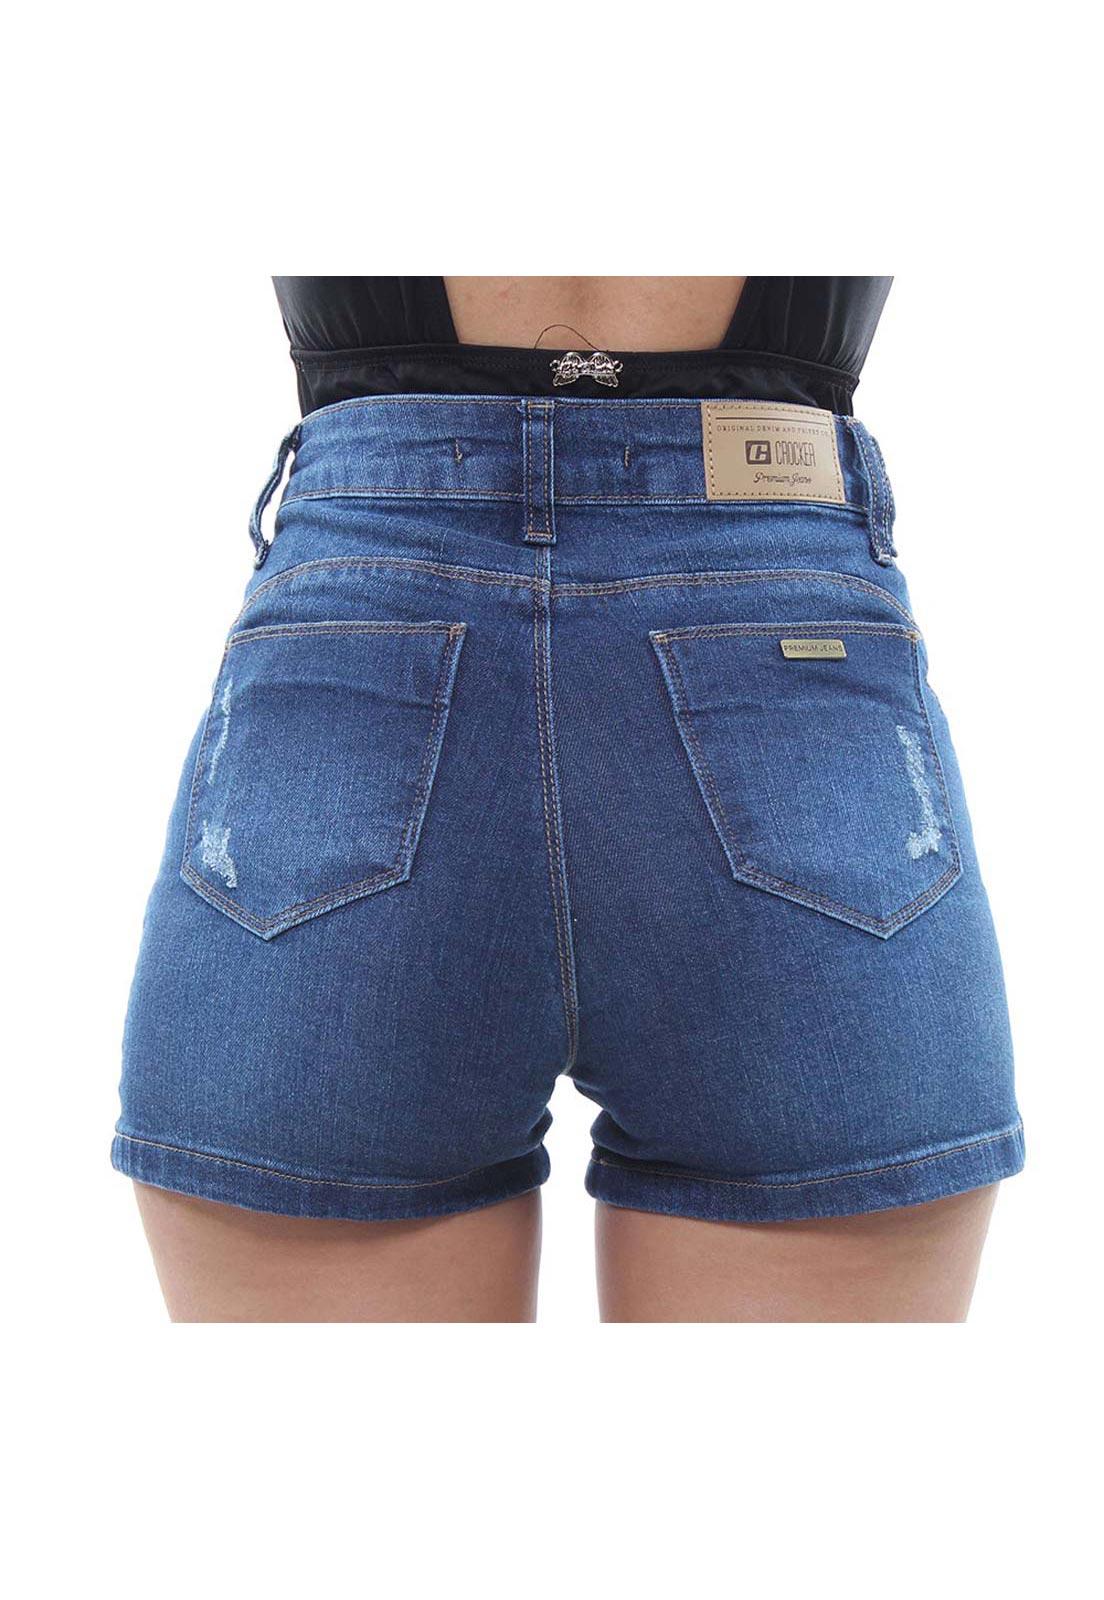 Short Jeans Feminino Curto Destroyed Fit Crocker - 47919  - CROCKER JEANS